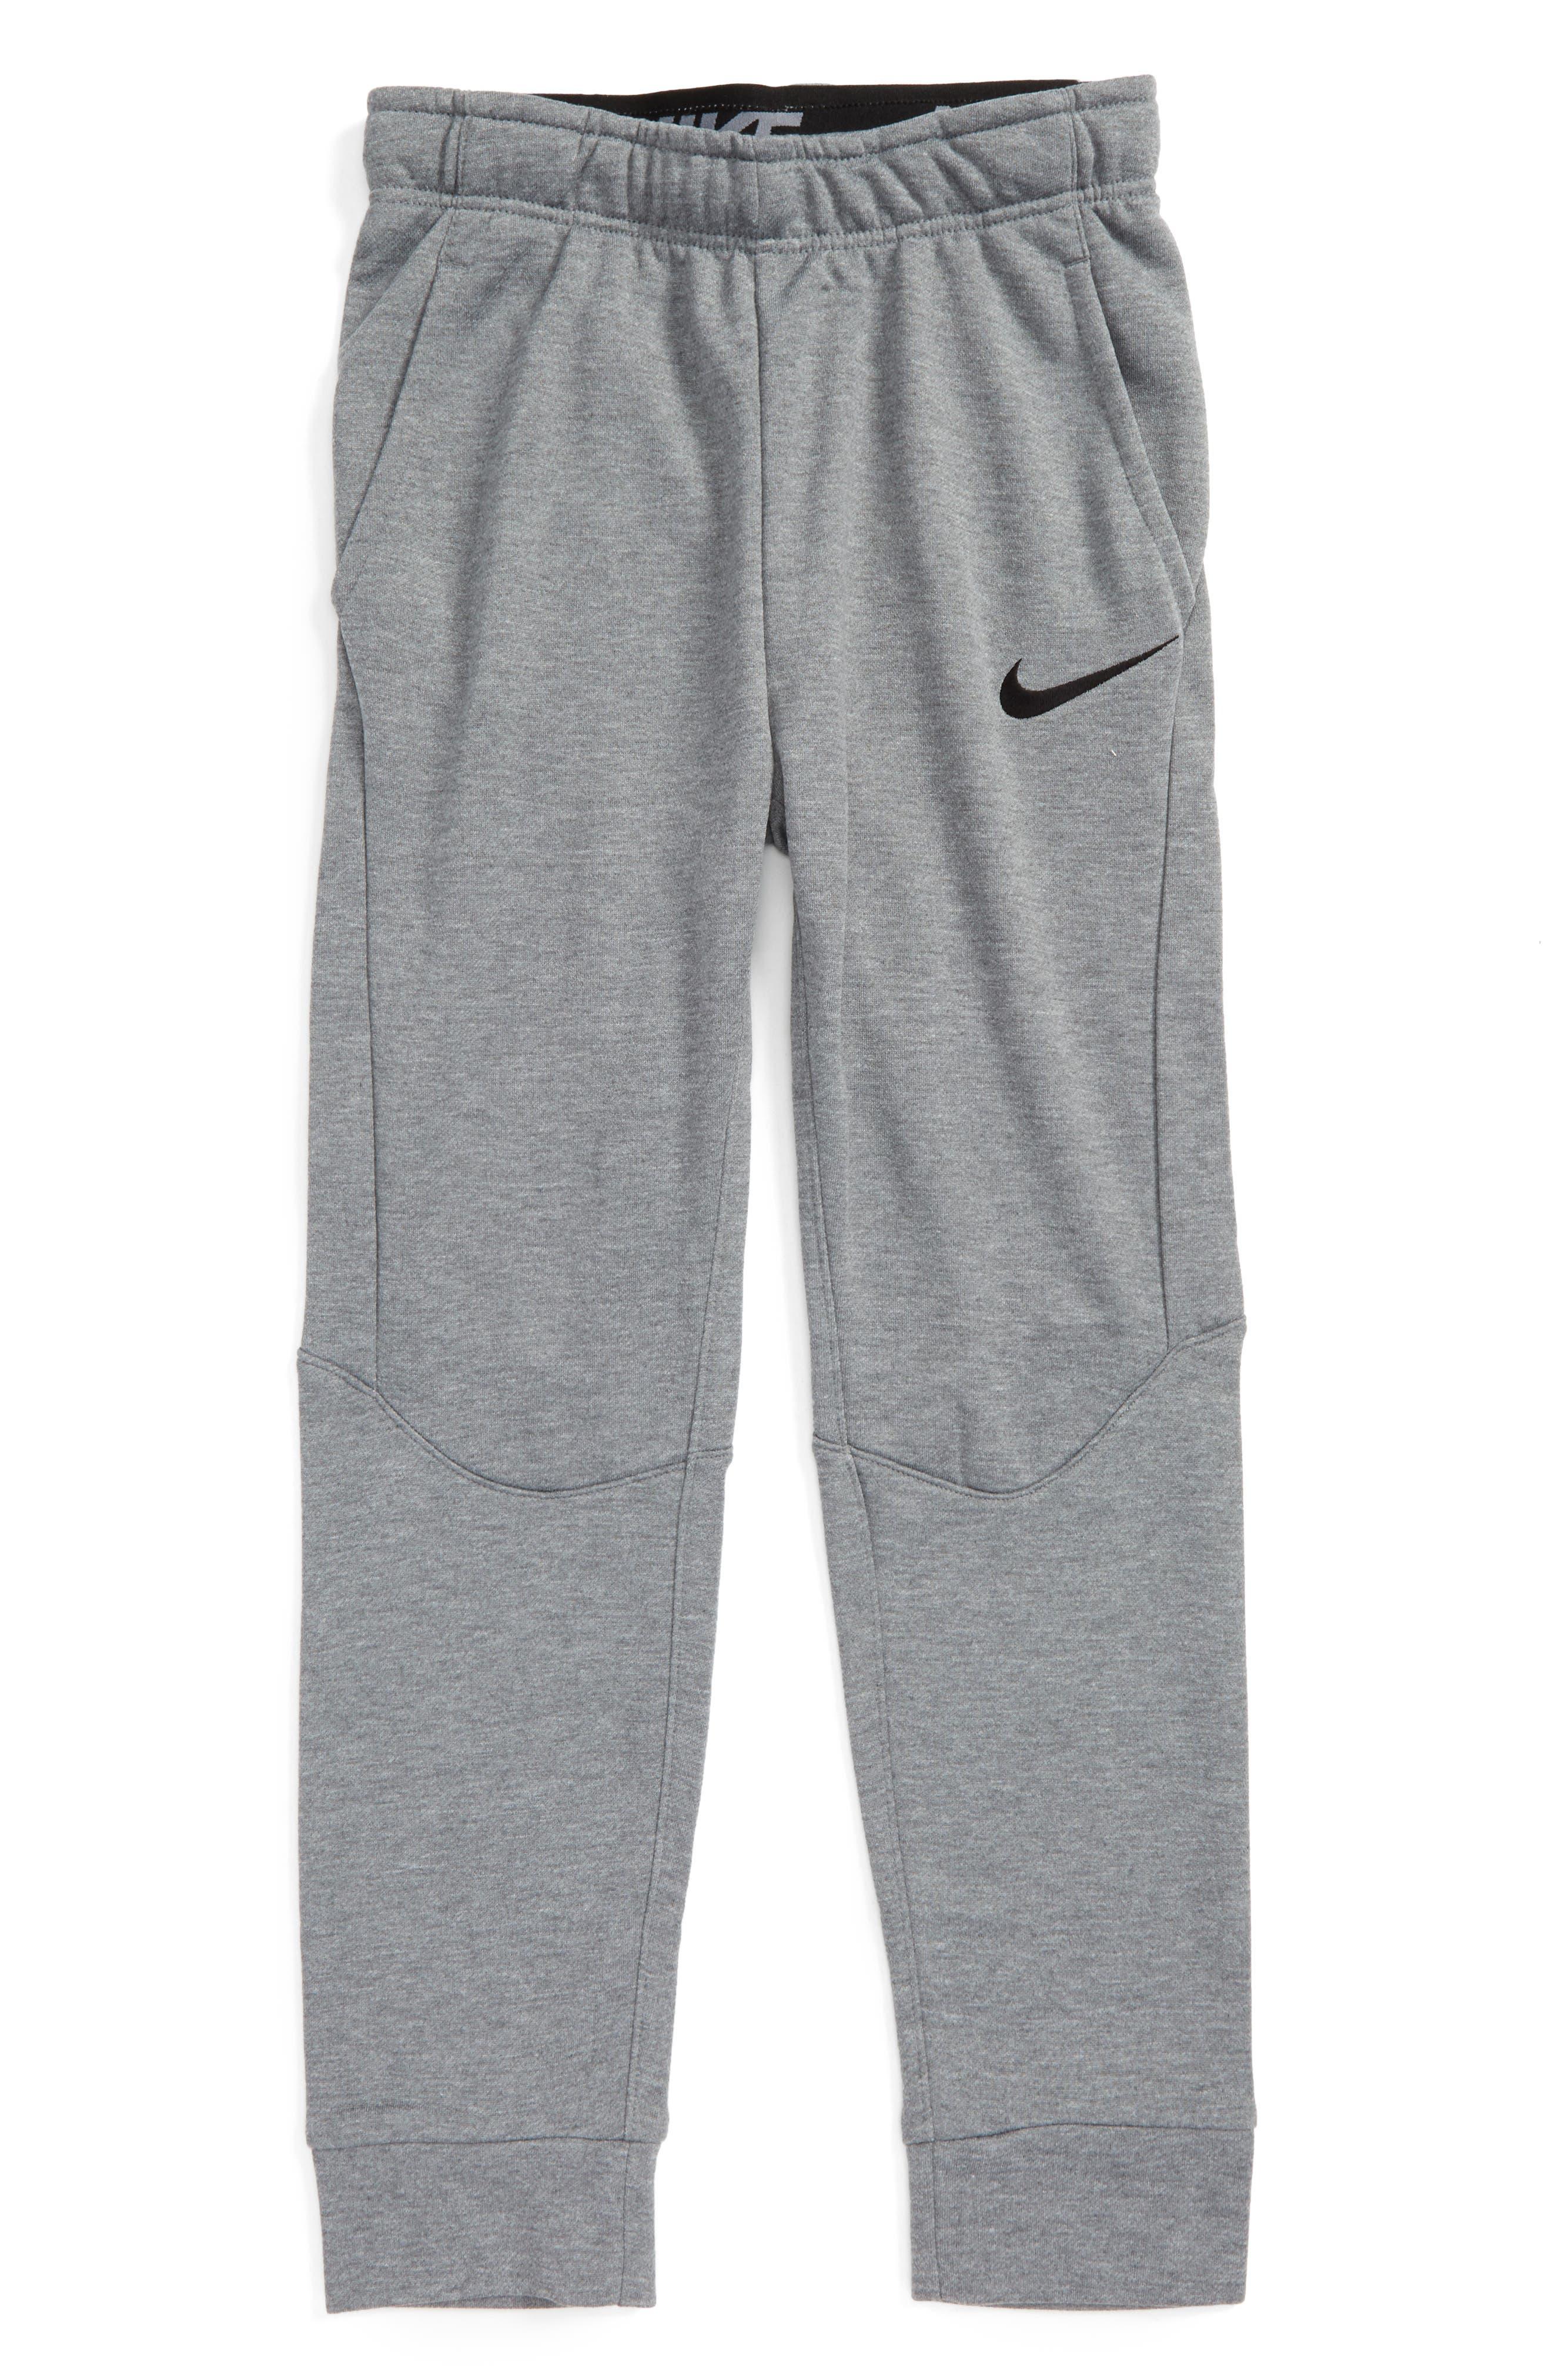 Dry Fleece Training Pants,                             Main thumbnail 1, color,                             Carb H/ Black